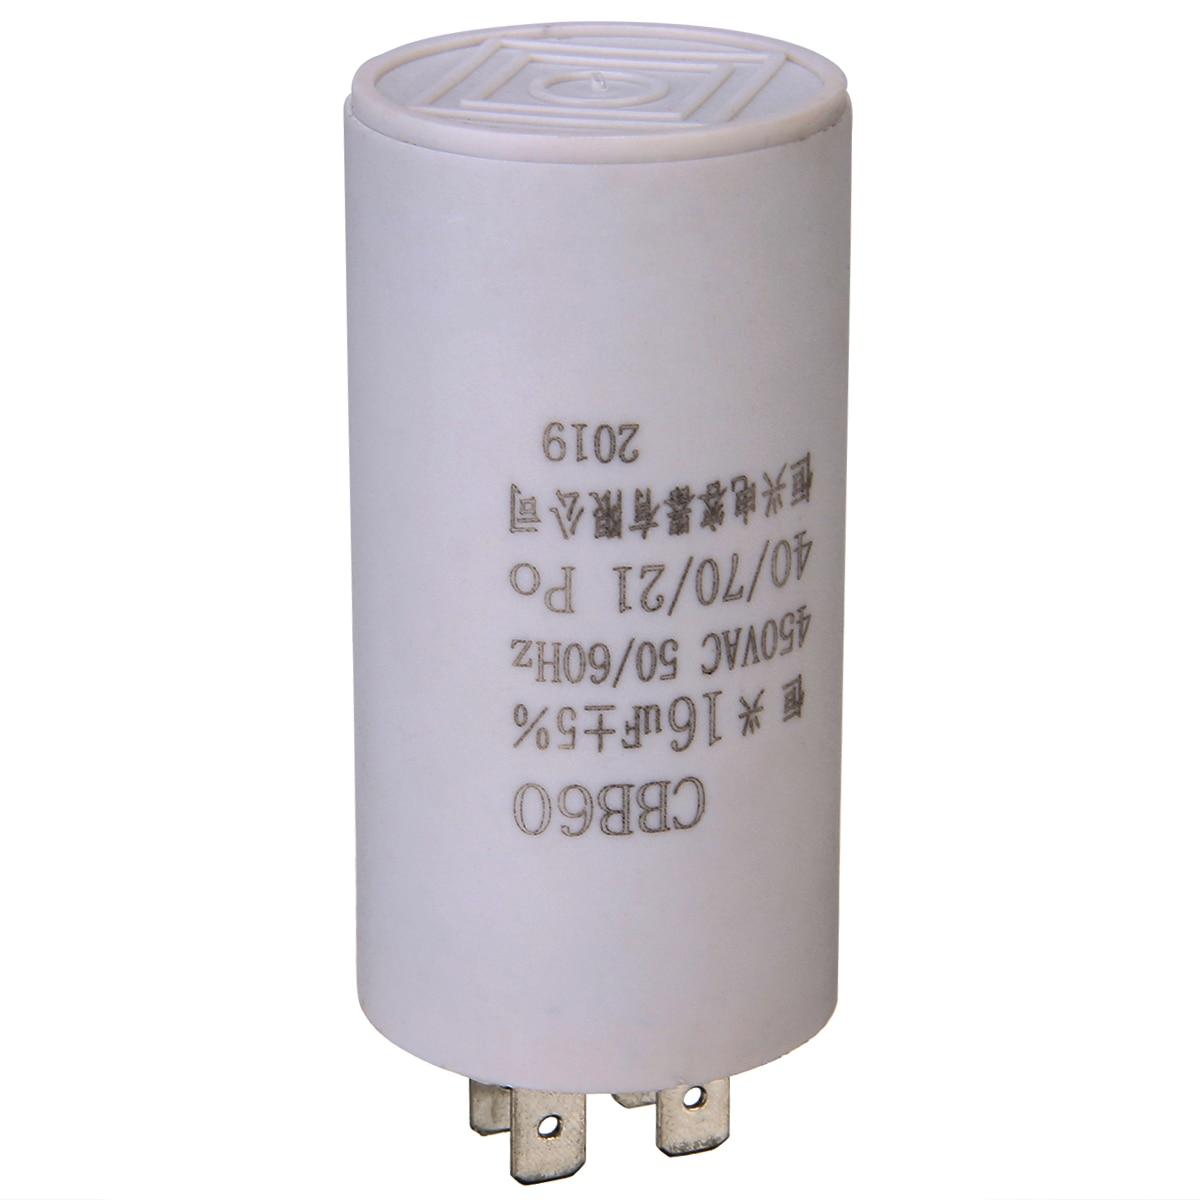 Kondensator Permanent Motor zu Kabel 2.5/16uF